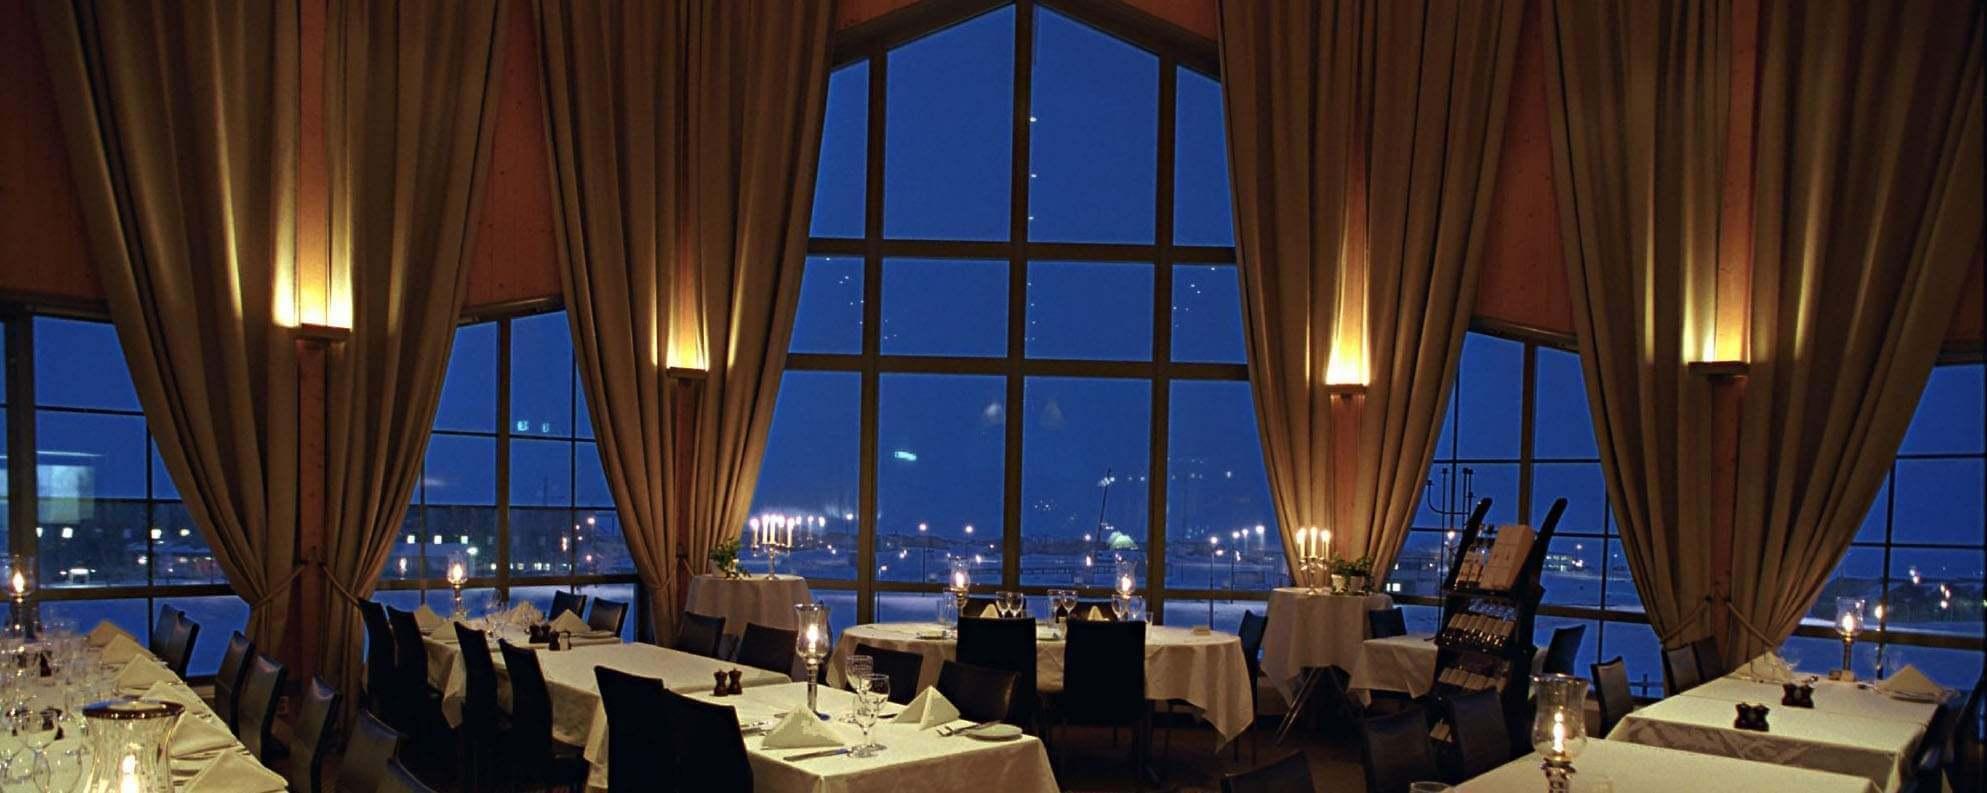 Hotel Radisson Blu Polar Spitsbergen